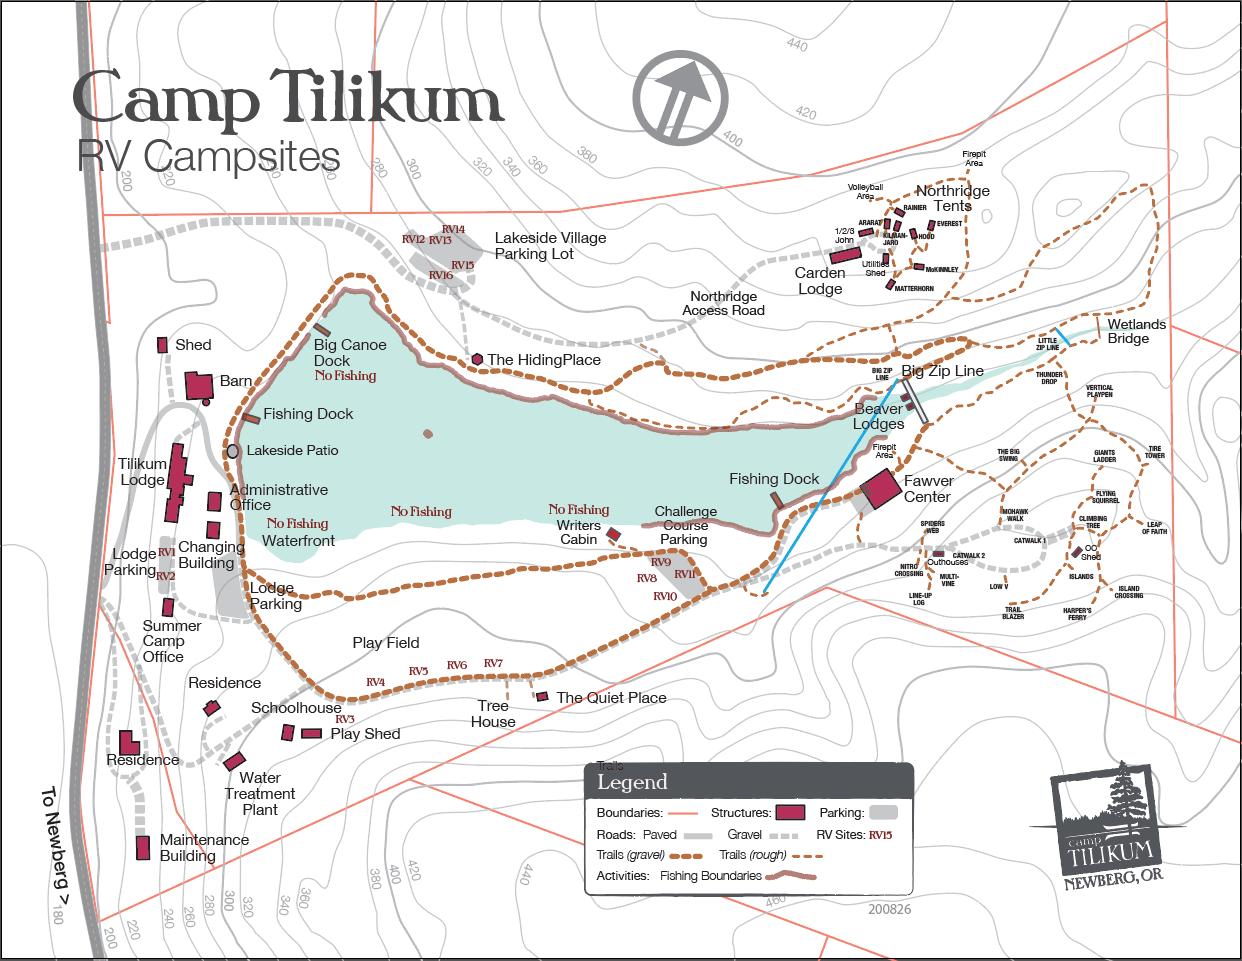 rv-campsite-site-map